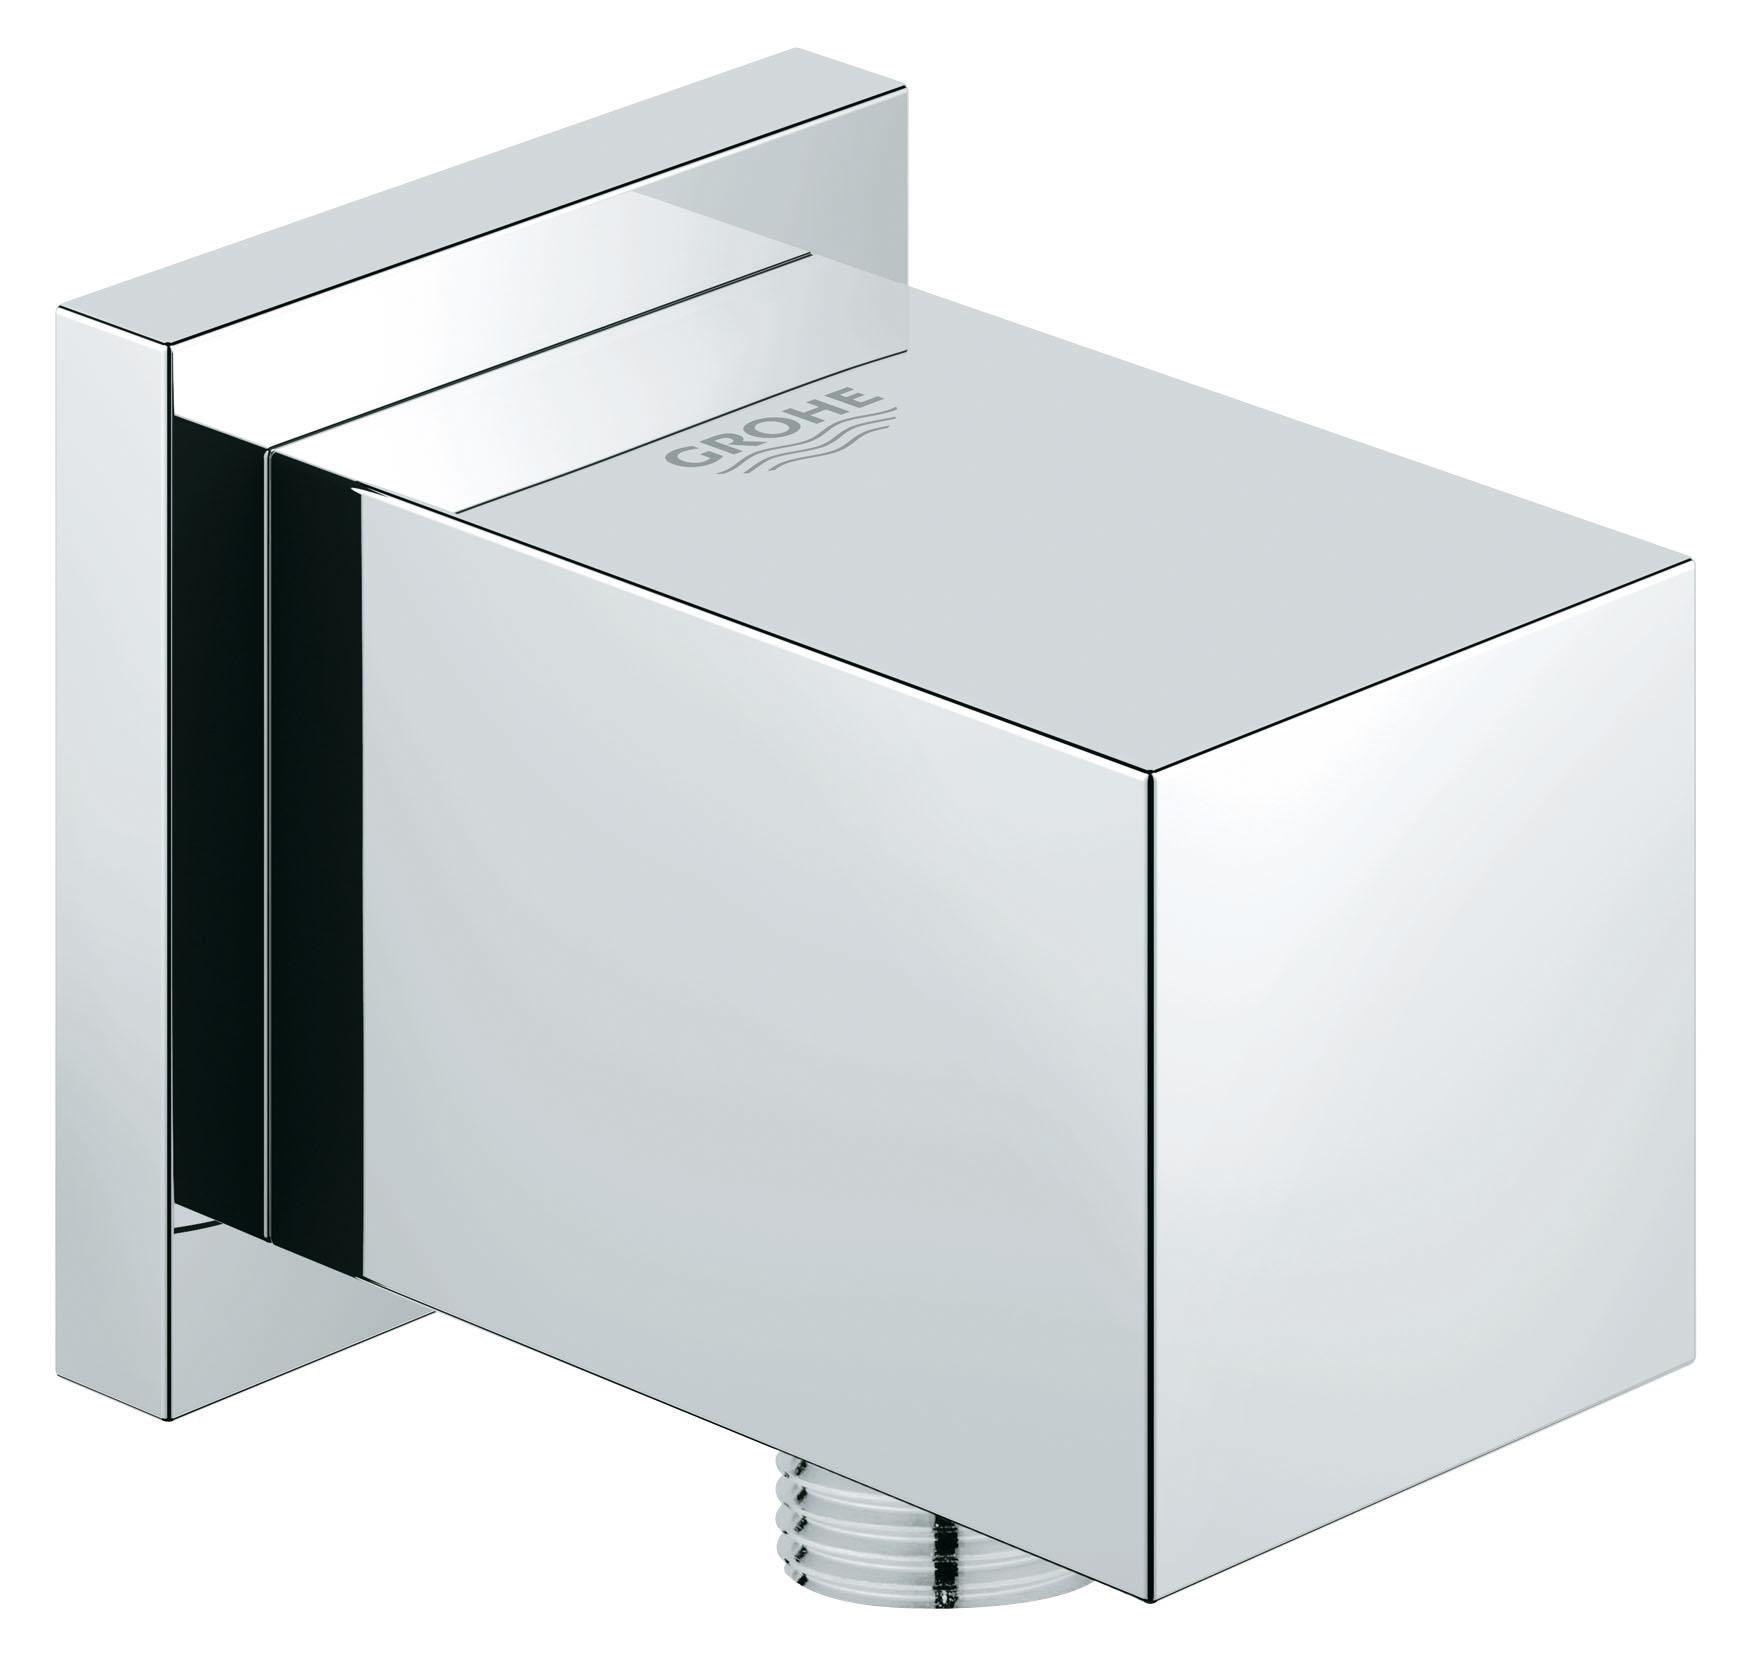 Подсоединение Grohe Euphoria cube 27704000 цена